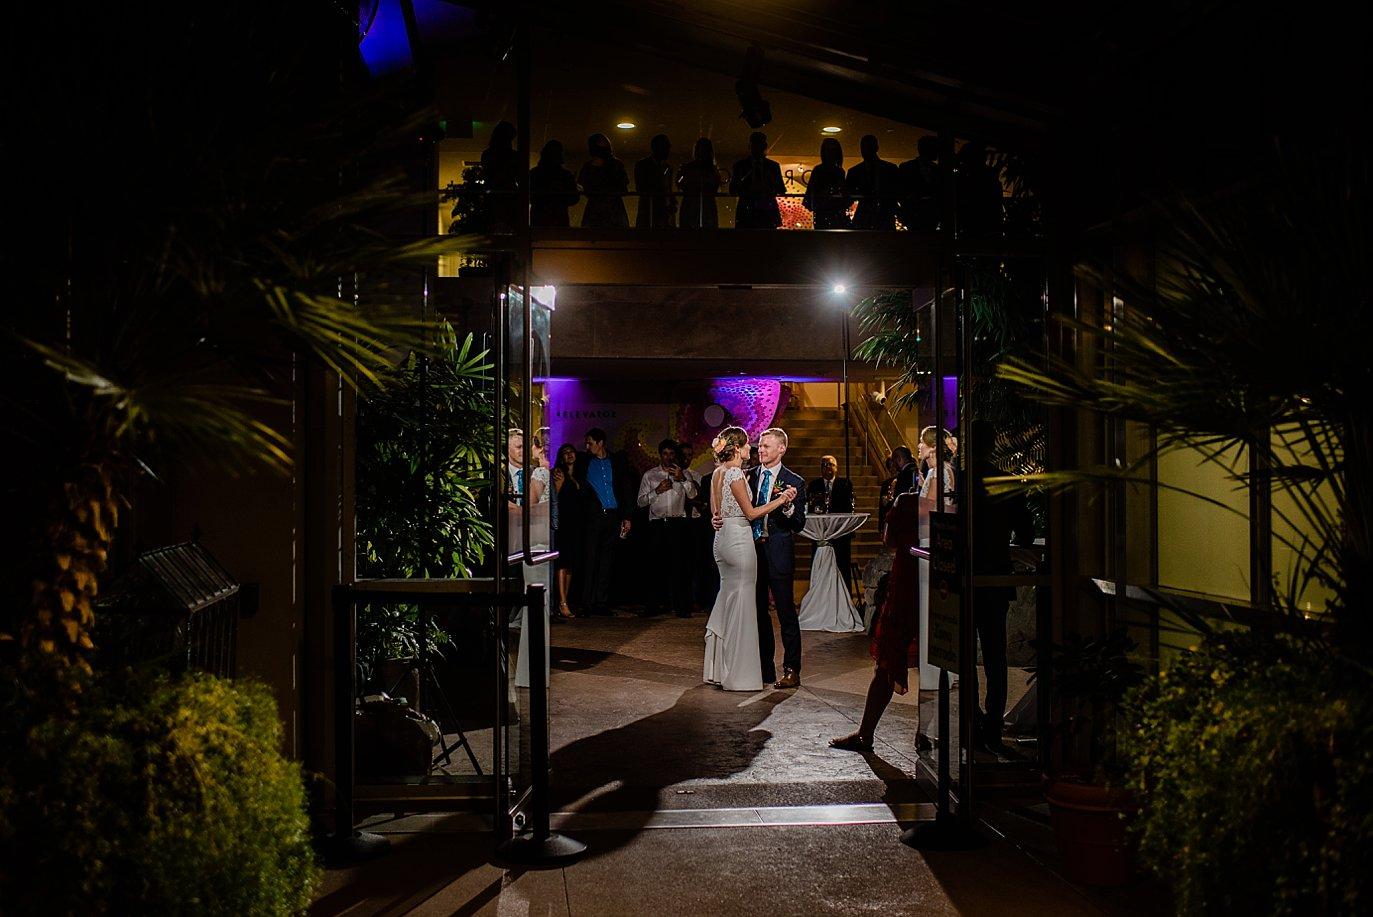 bride and groom first dance in Marnie's pavilion at Denver Botanic Gardens by Denver wedding photographer Jennie Crate